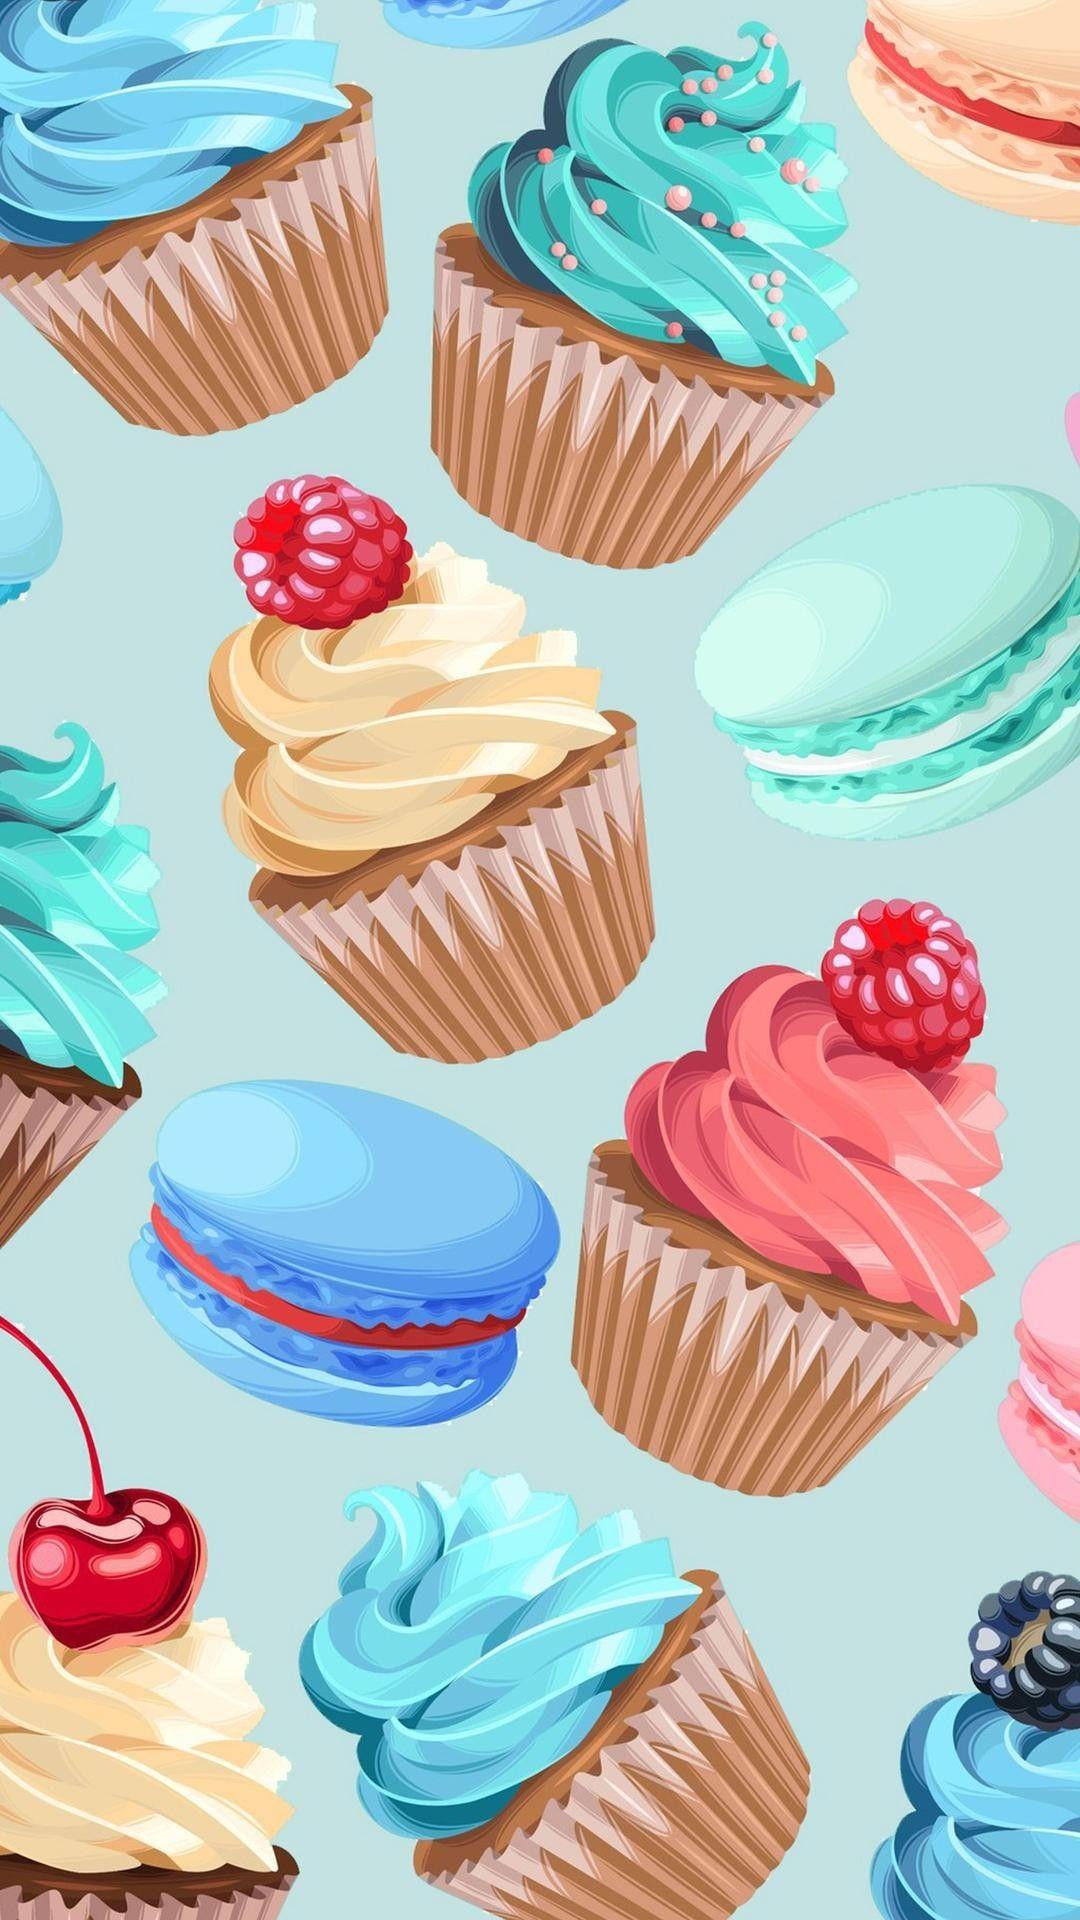 Pin By H Ali On Wallpapers Cupcakes Wallpaper Cake Wallpaper Wallpaper Iphone Cute